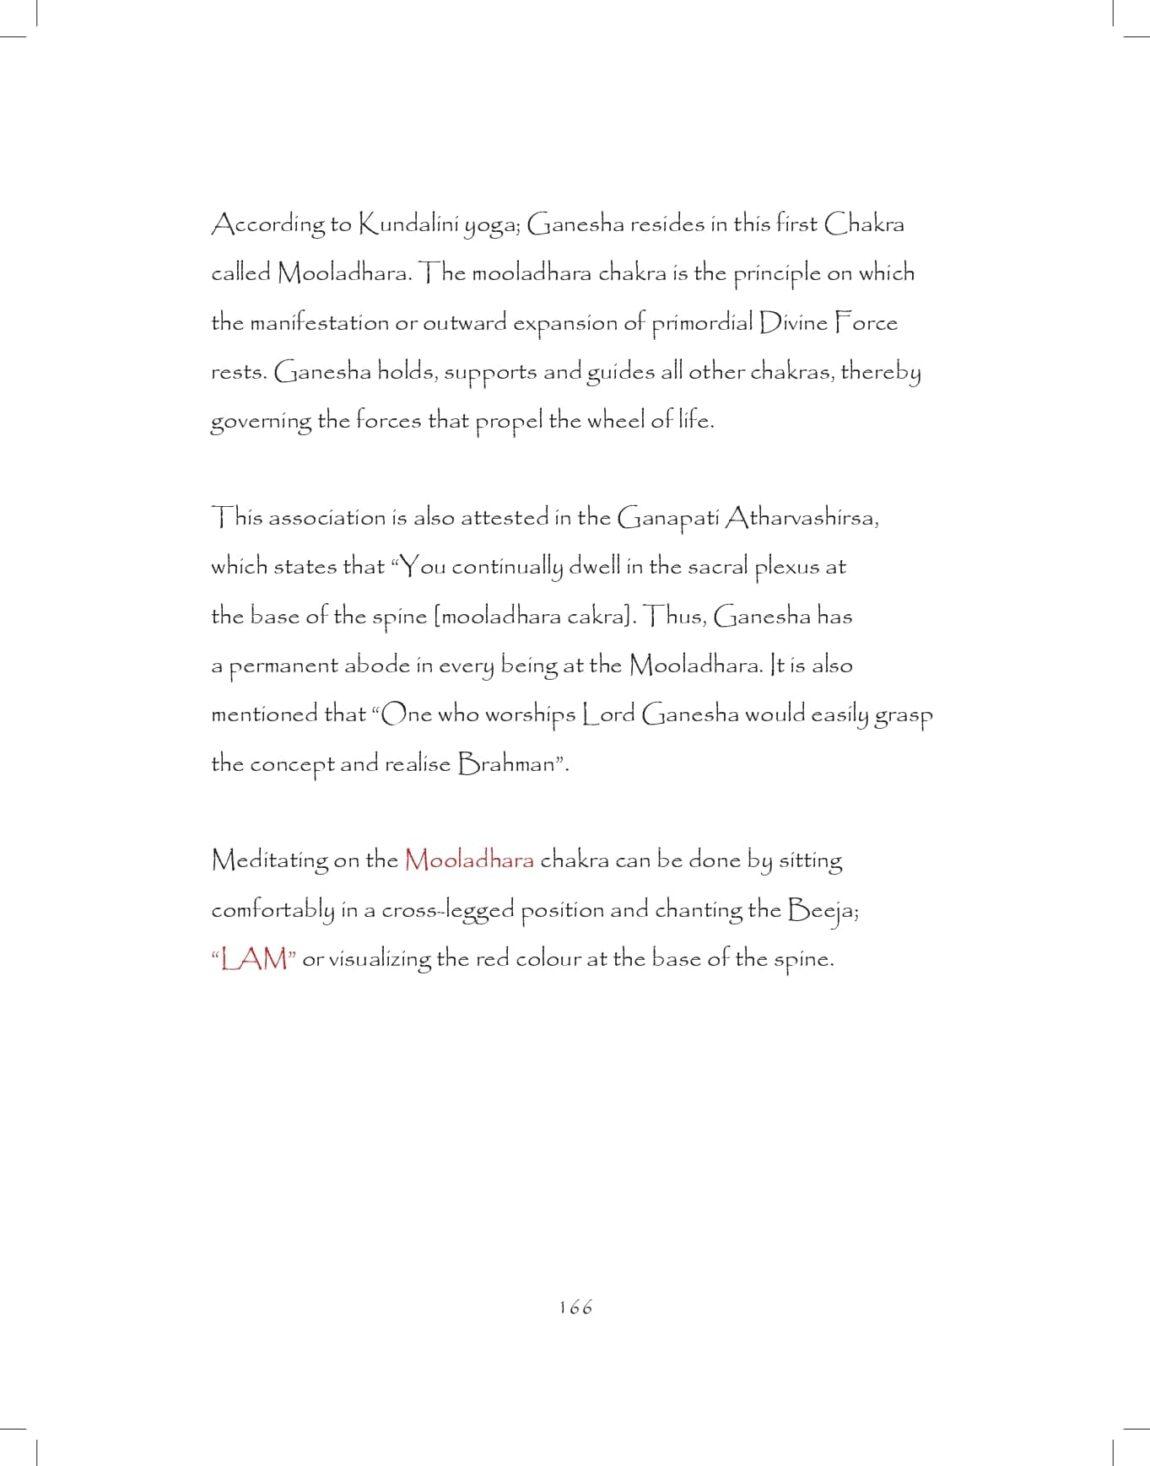 Ganesh-print_pages-to-jpg-0166.jpg